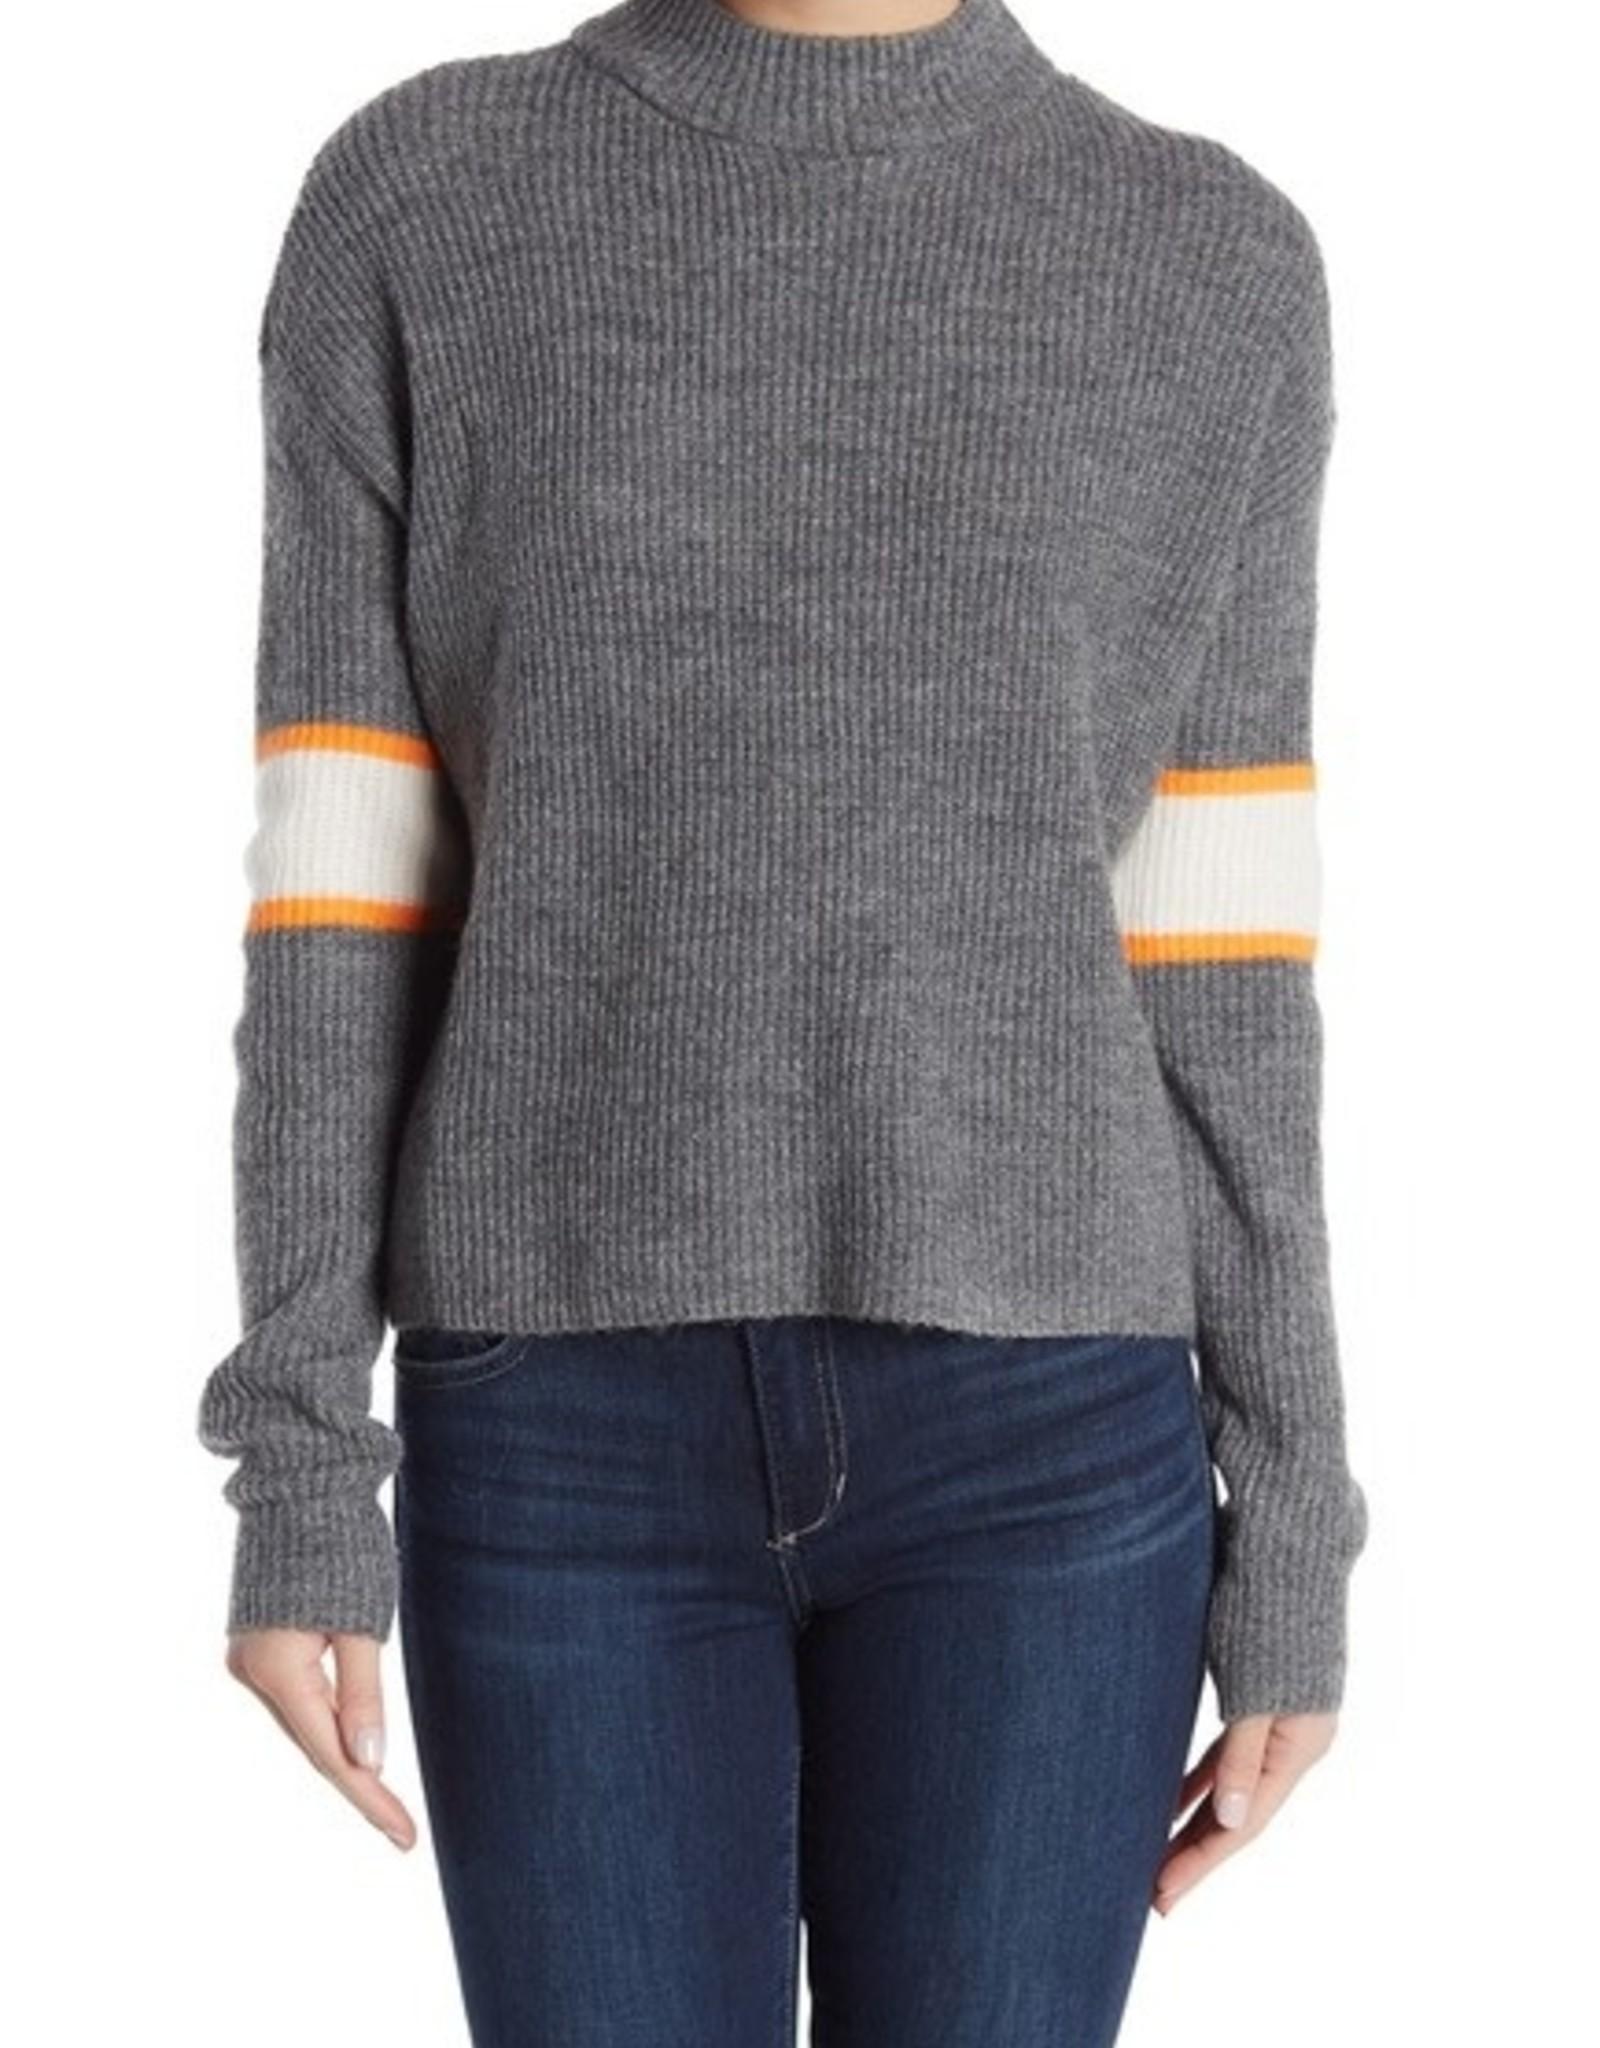 John+Jenn John & Jenn Varsity Stripe Mock Neck Pullover Sweater Size XL